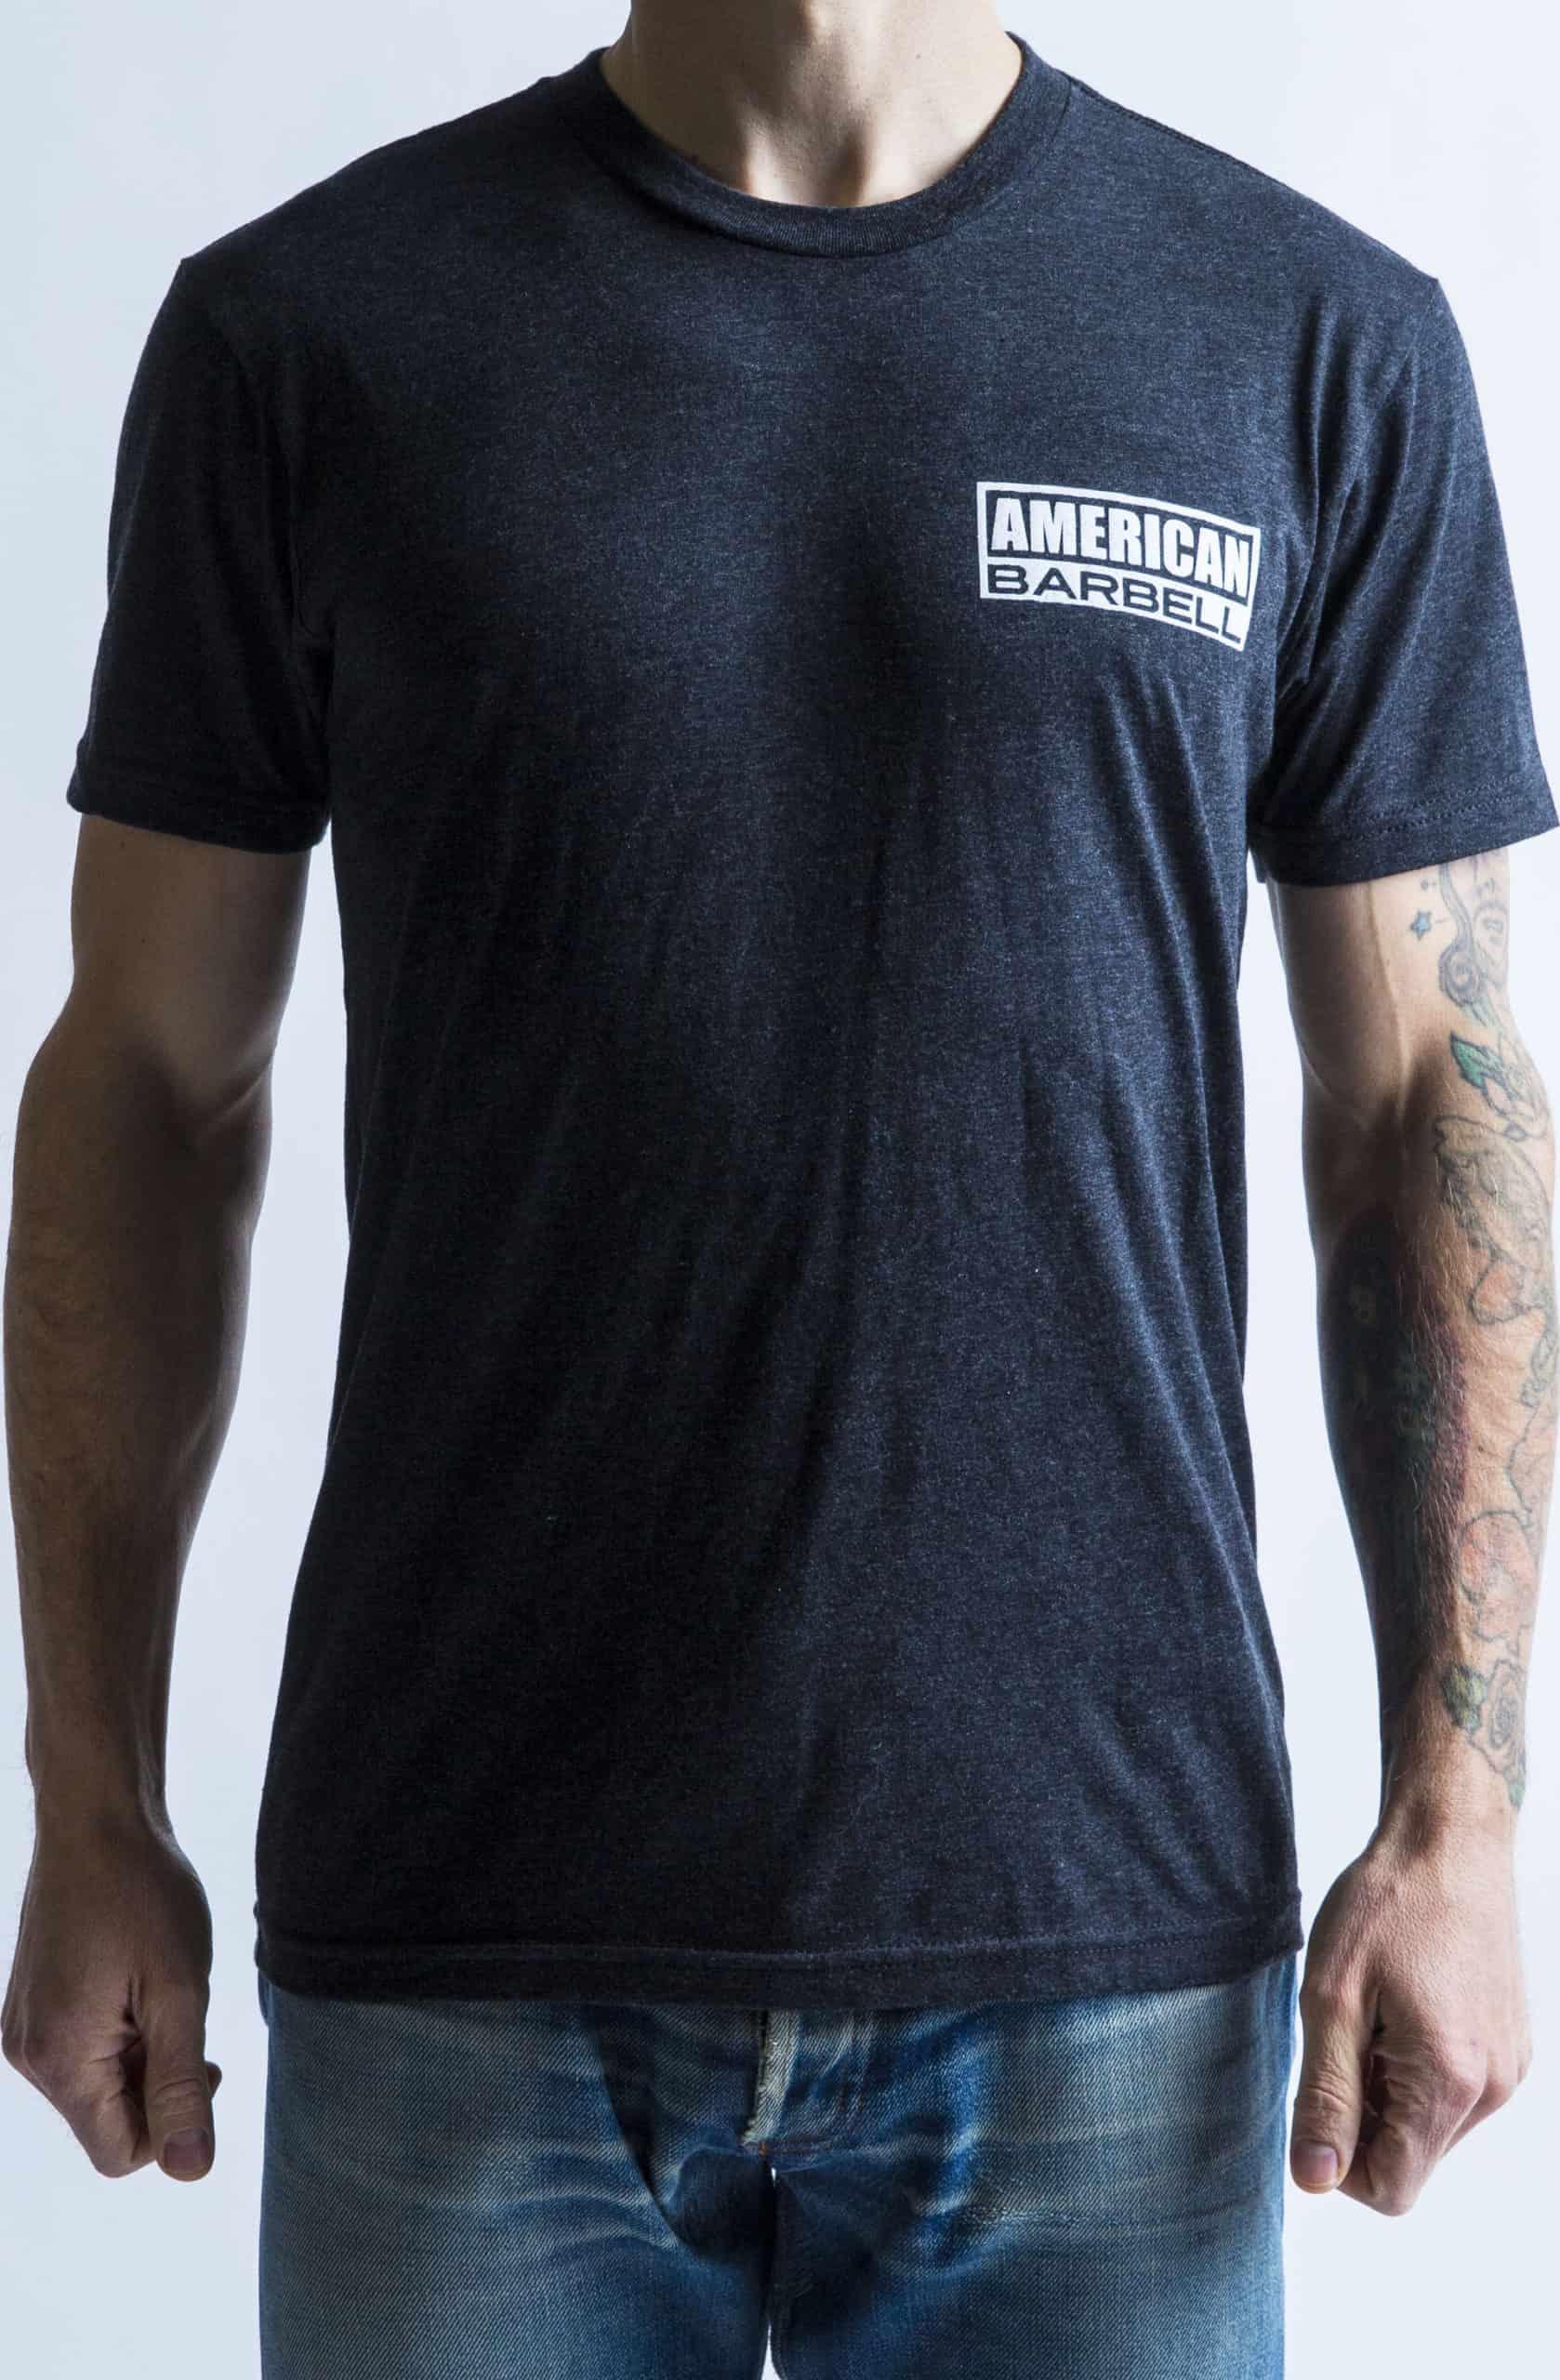 American Barbell Starter T-Shirt front worn